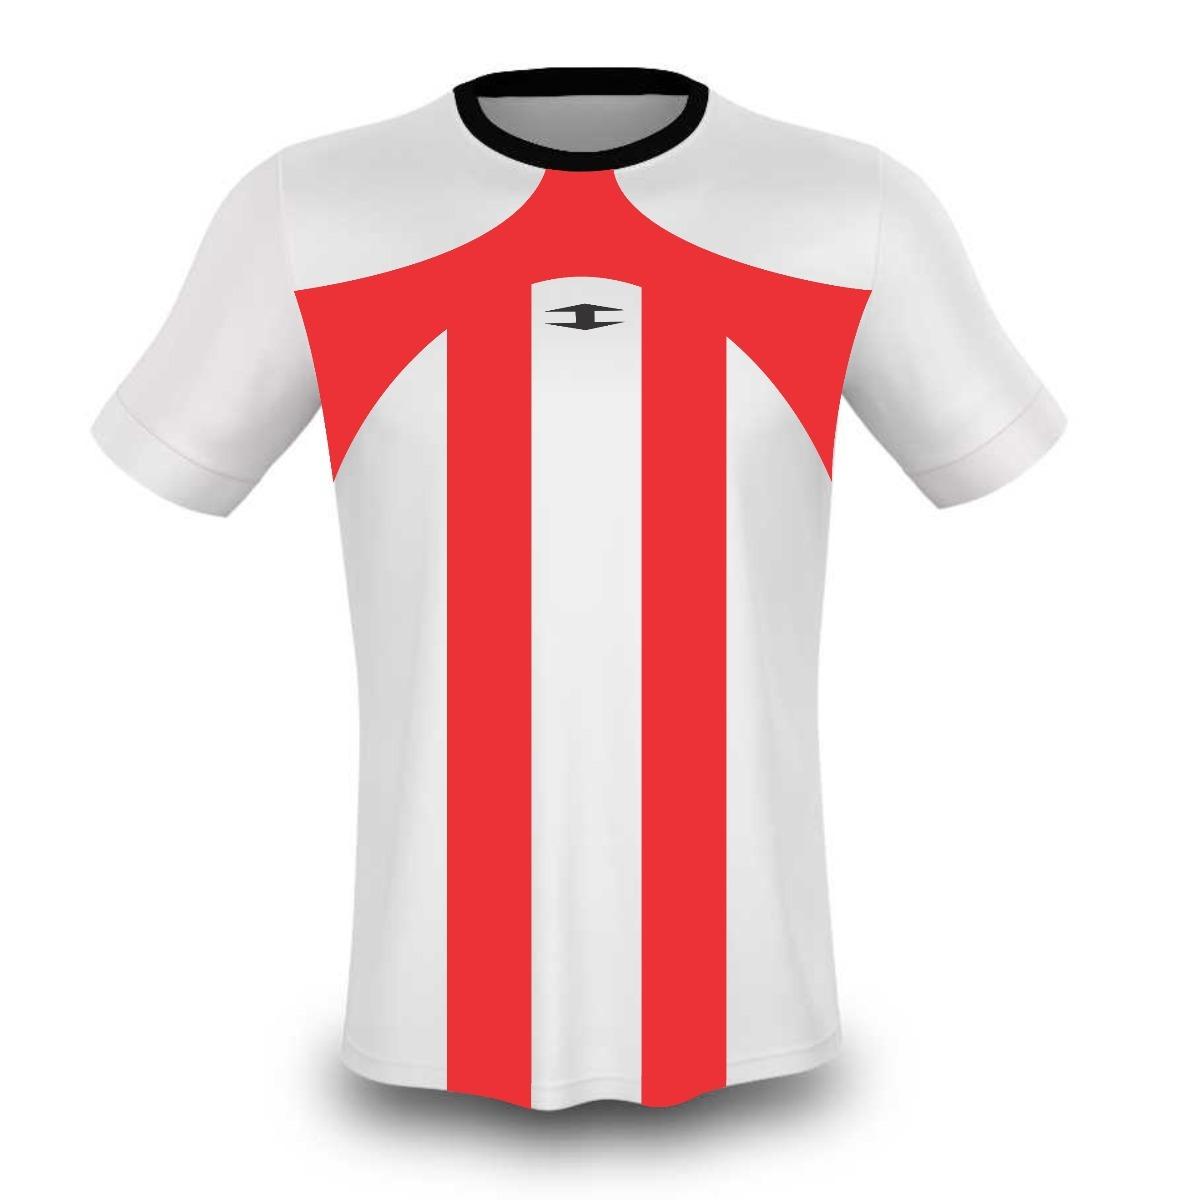 637a0b1a0ac30 pack camiseta futbol equipo de 10 komba optima c numeros. Cargando zoom.